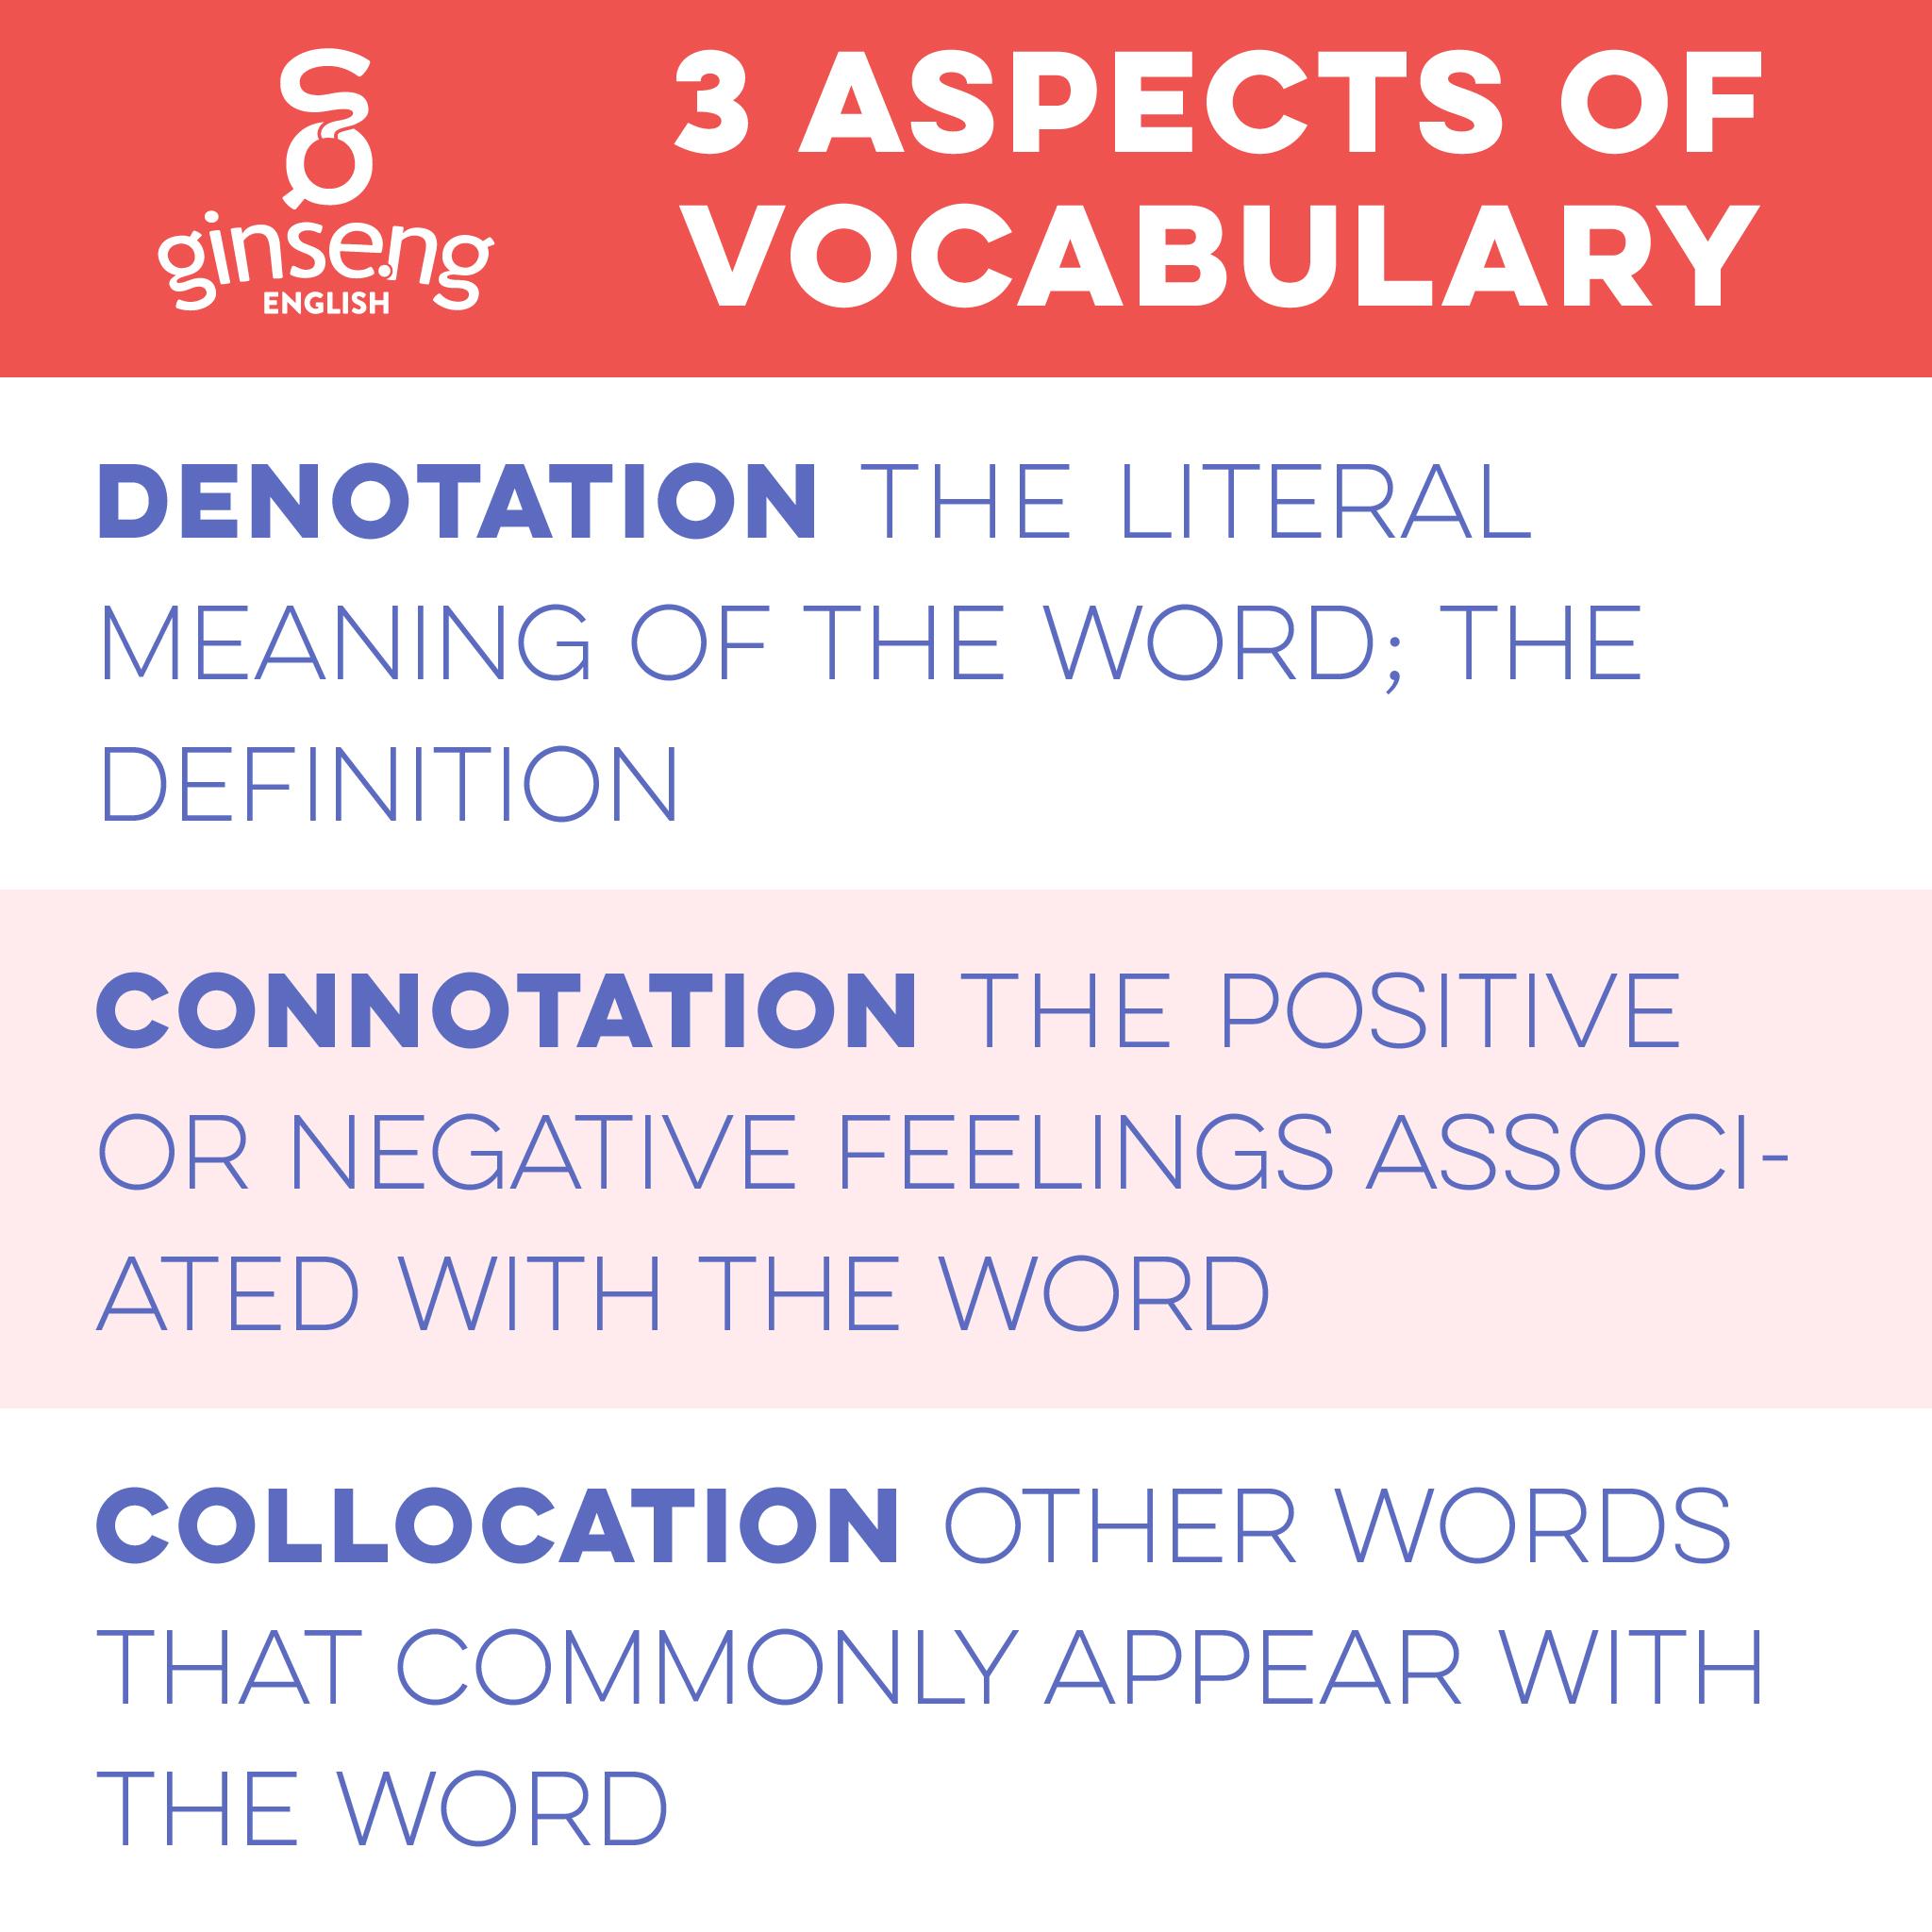 Denotation, Connotation, and Collocation